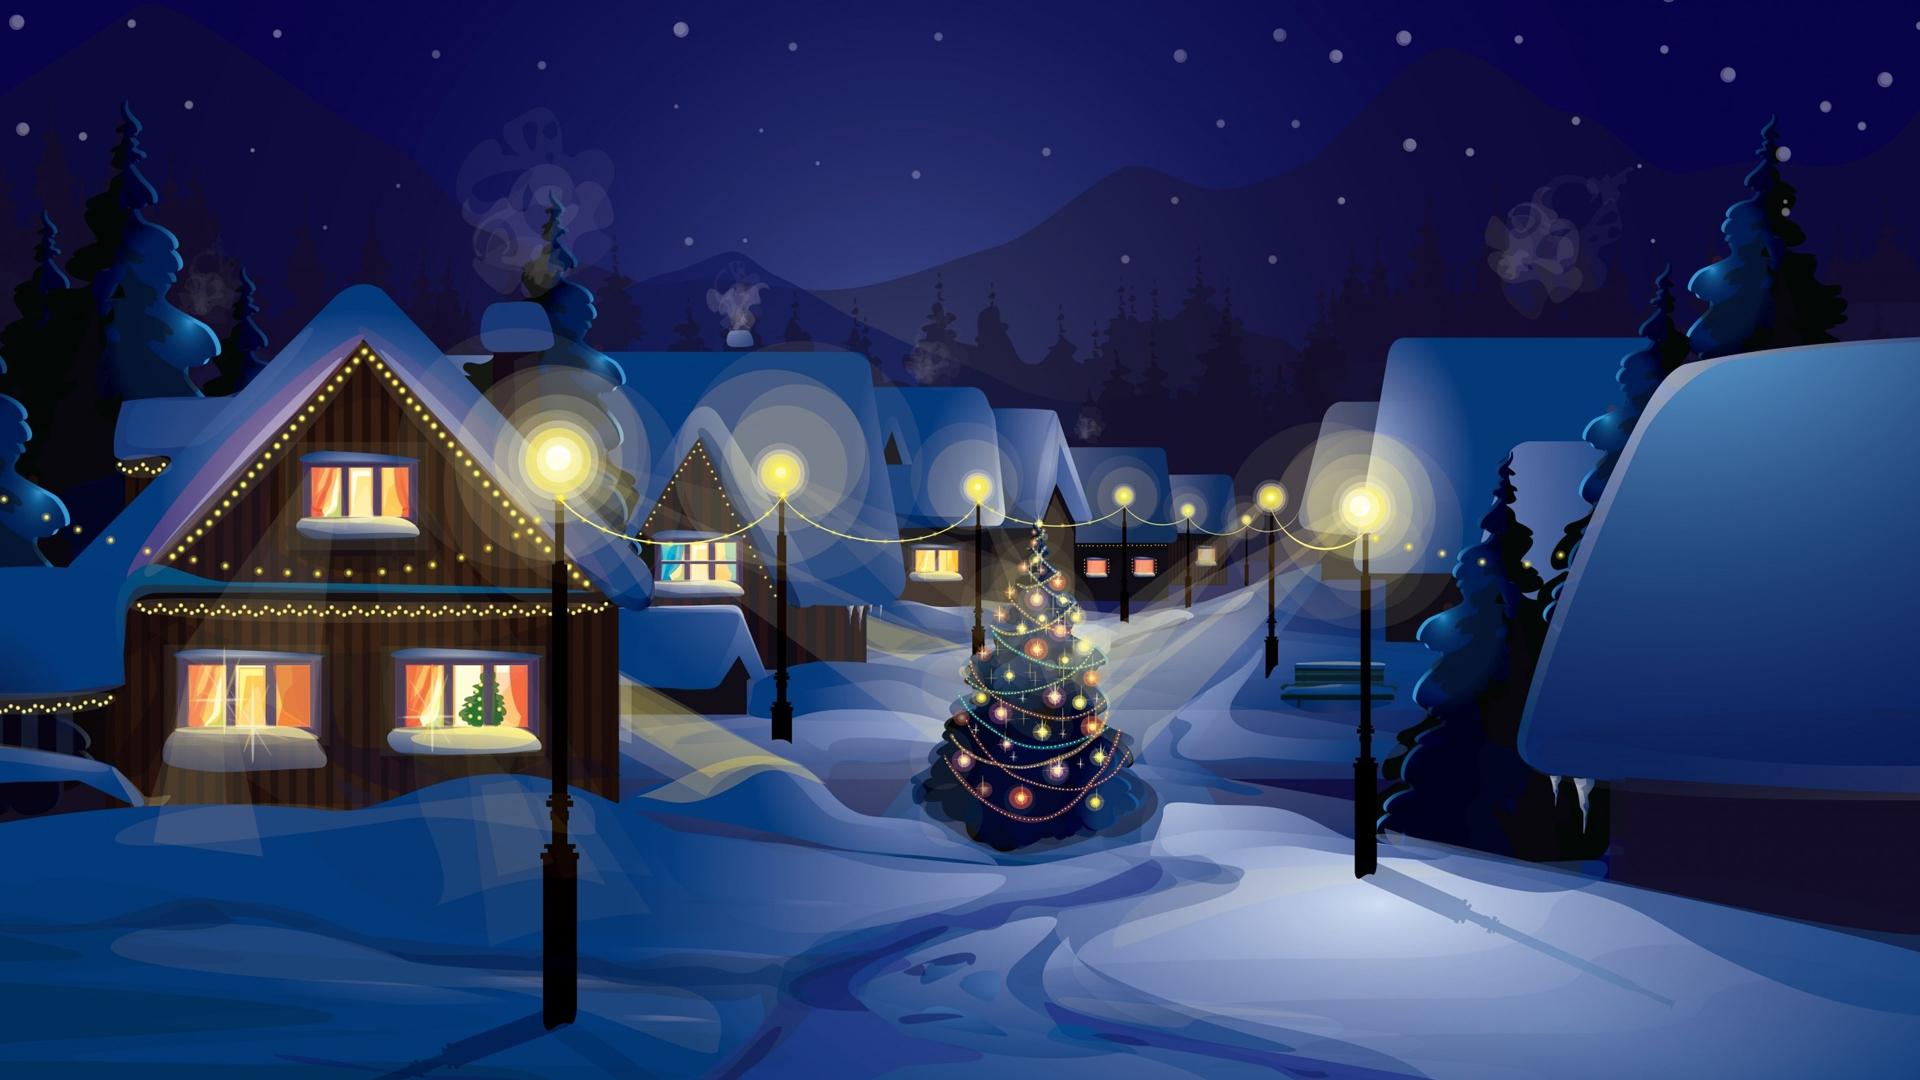 Christmas Backgrounds Best for Kodi 3